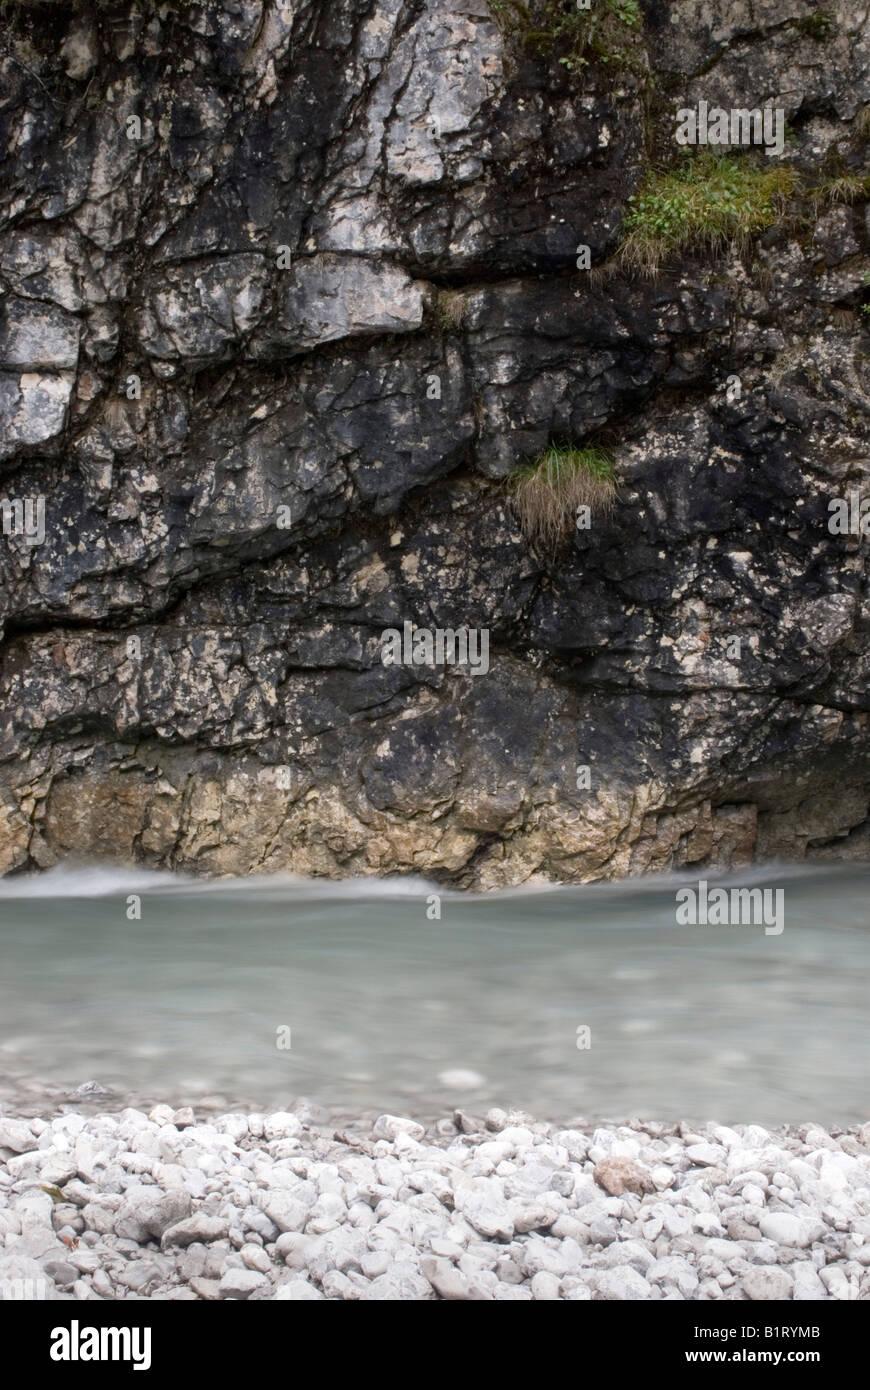 Schwarzwassertal Gorge, near confluence with the Lech River, Lechtal, Tyrol, Austria, Europe - Stock Image